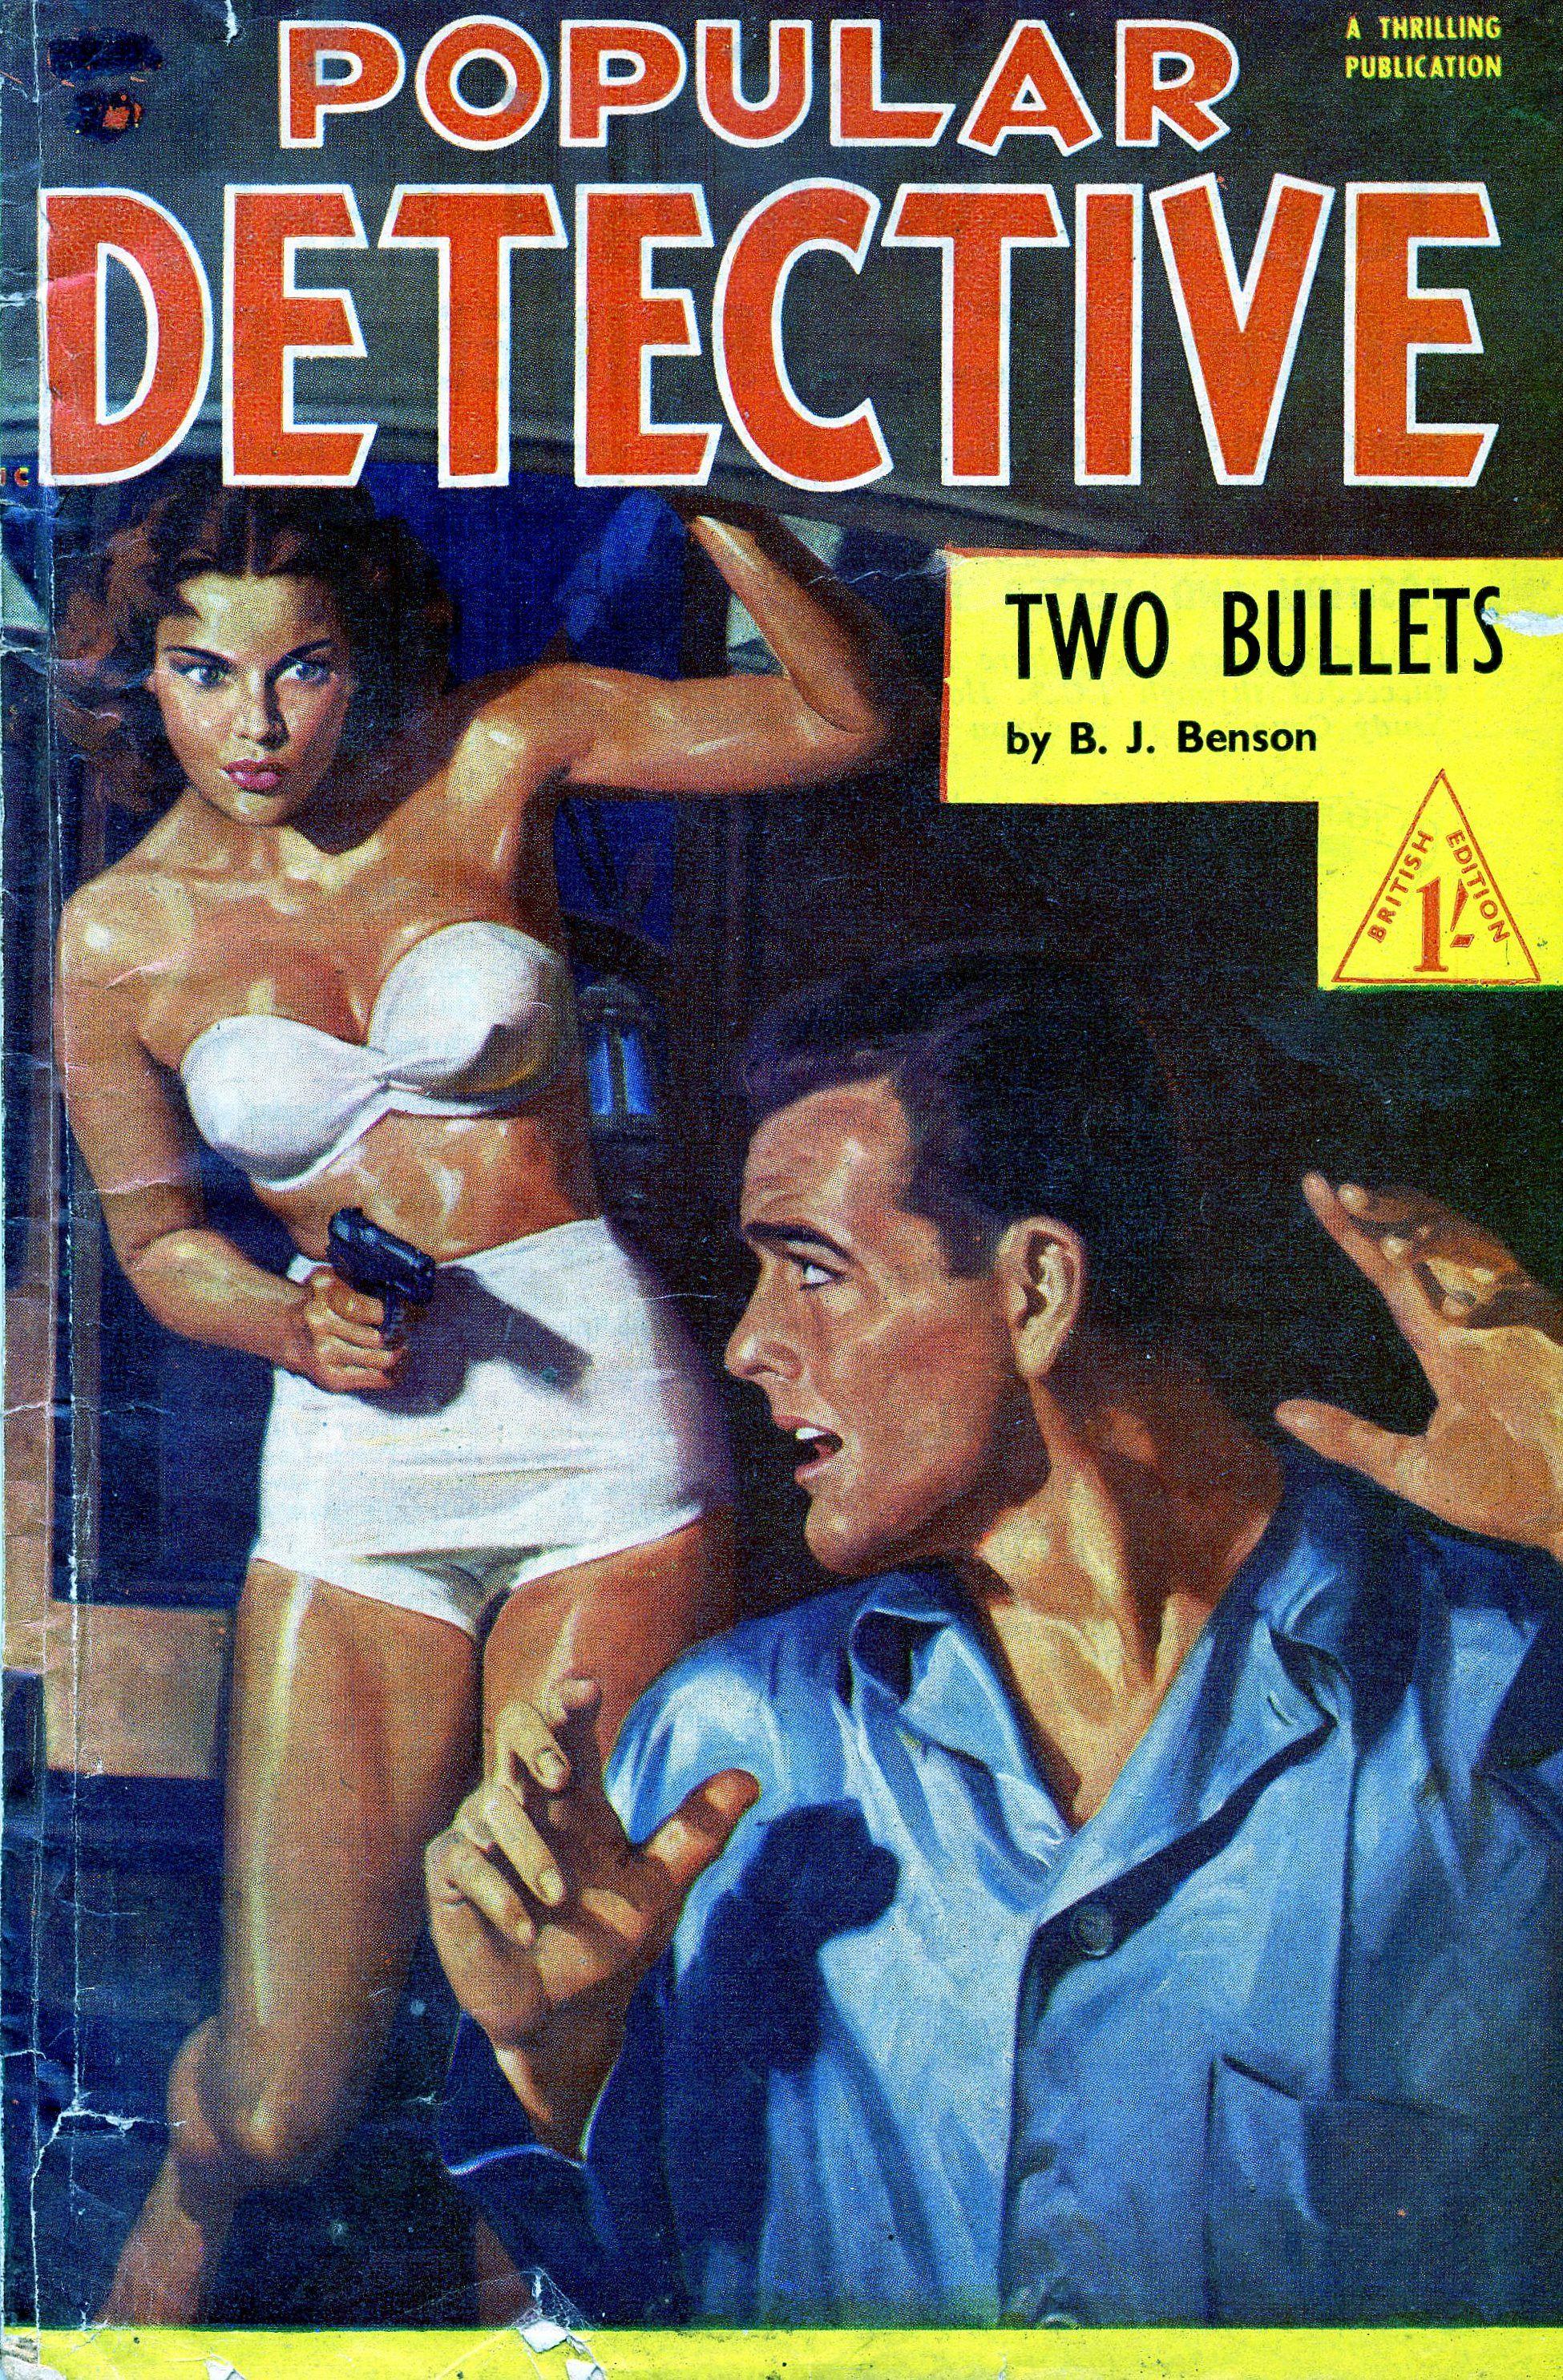 Pulp Covers Pulp Fiction Art Pulp Fiction Pulp Novels